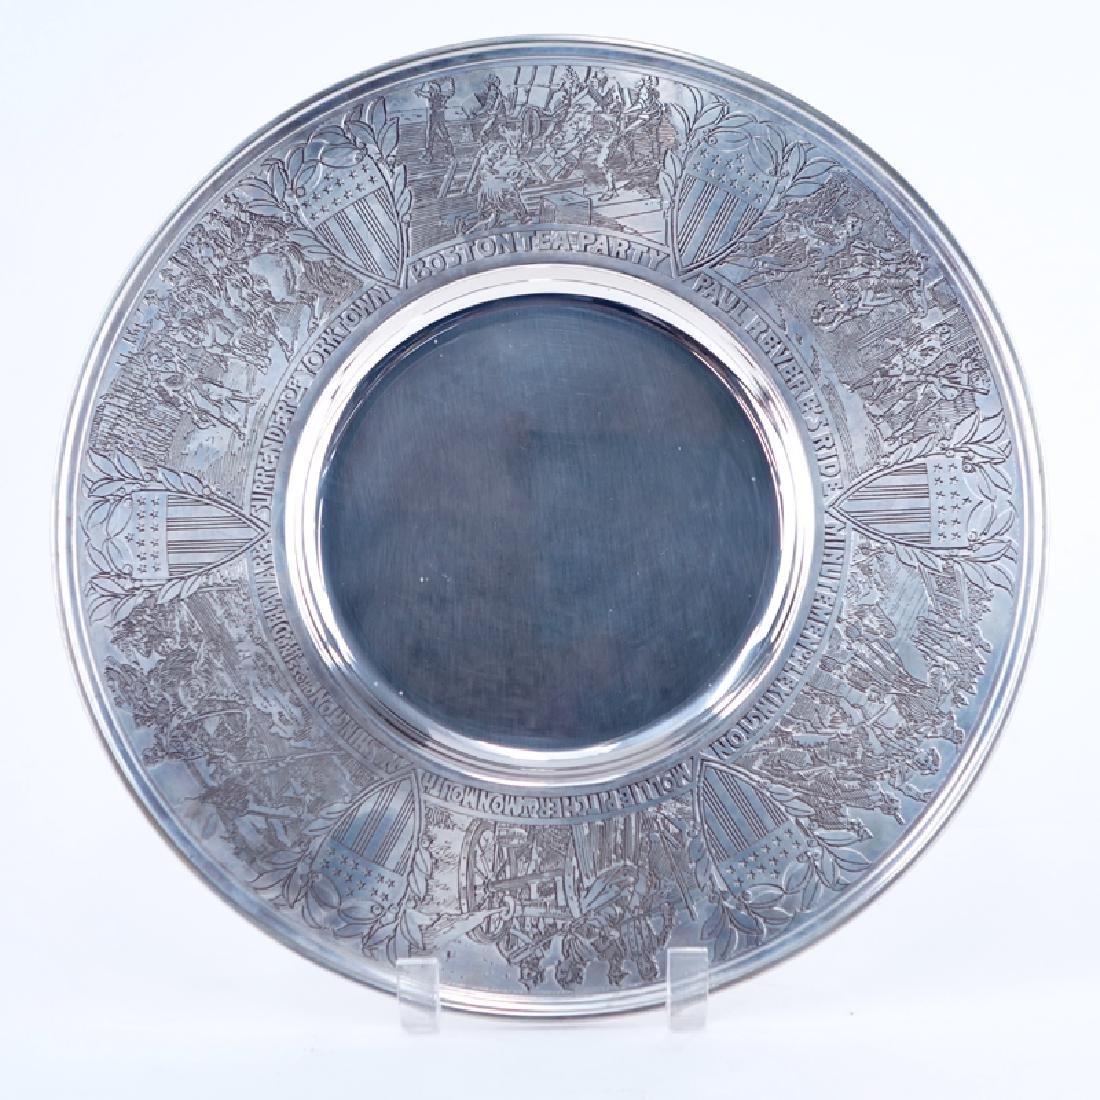 Gorham Sterling Silver 1972 Bicentennial Commemorative